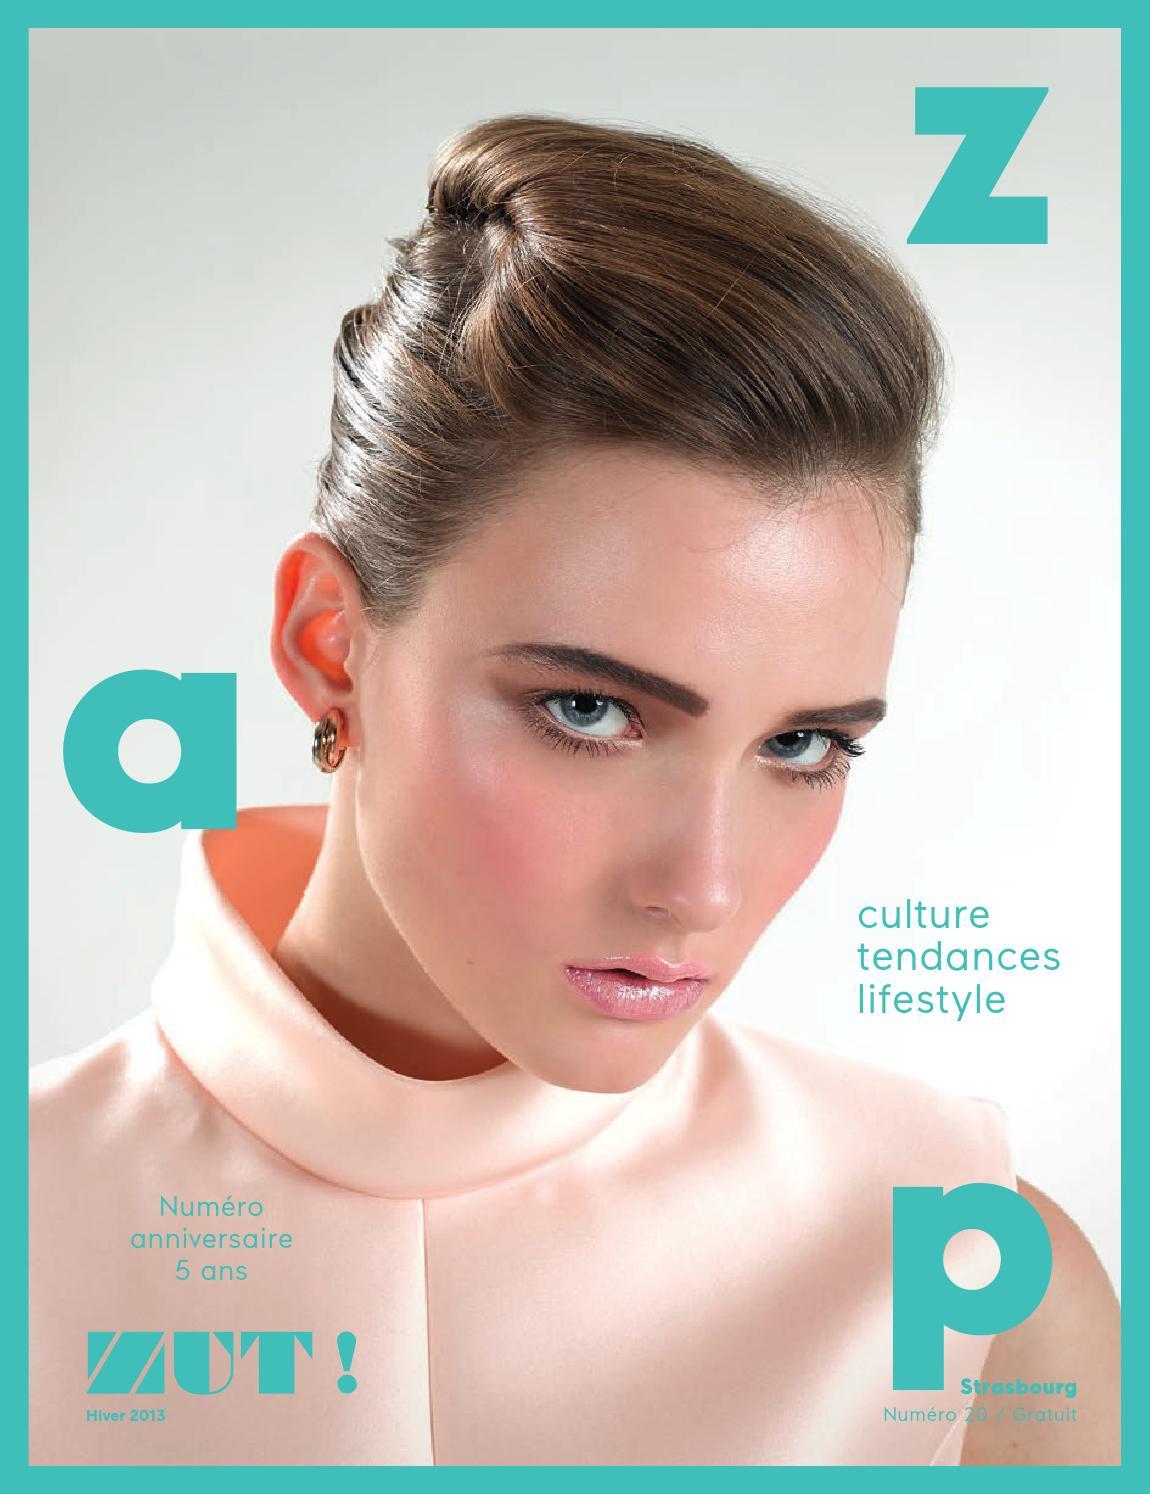 e742f0d0c2312b Zut 20 strasbourg by Zut Magazine - issuu